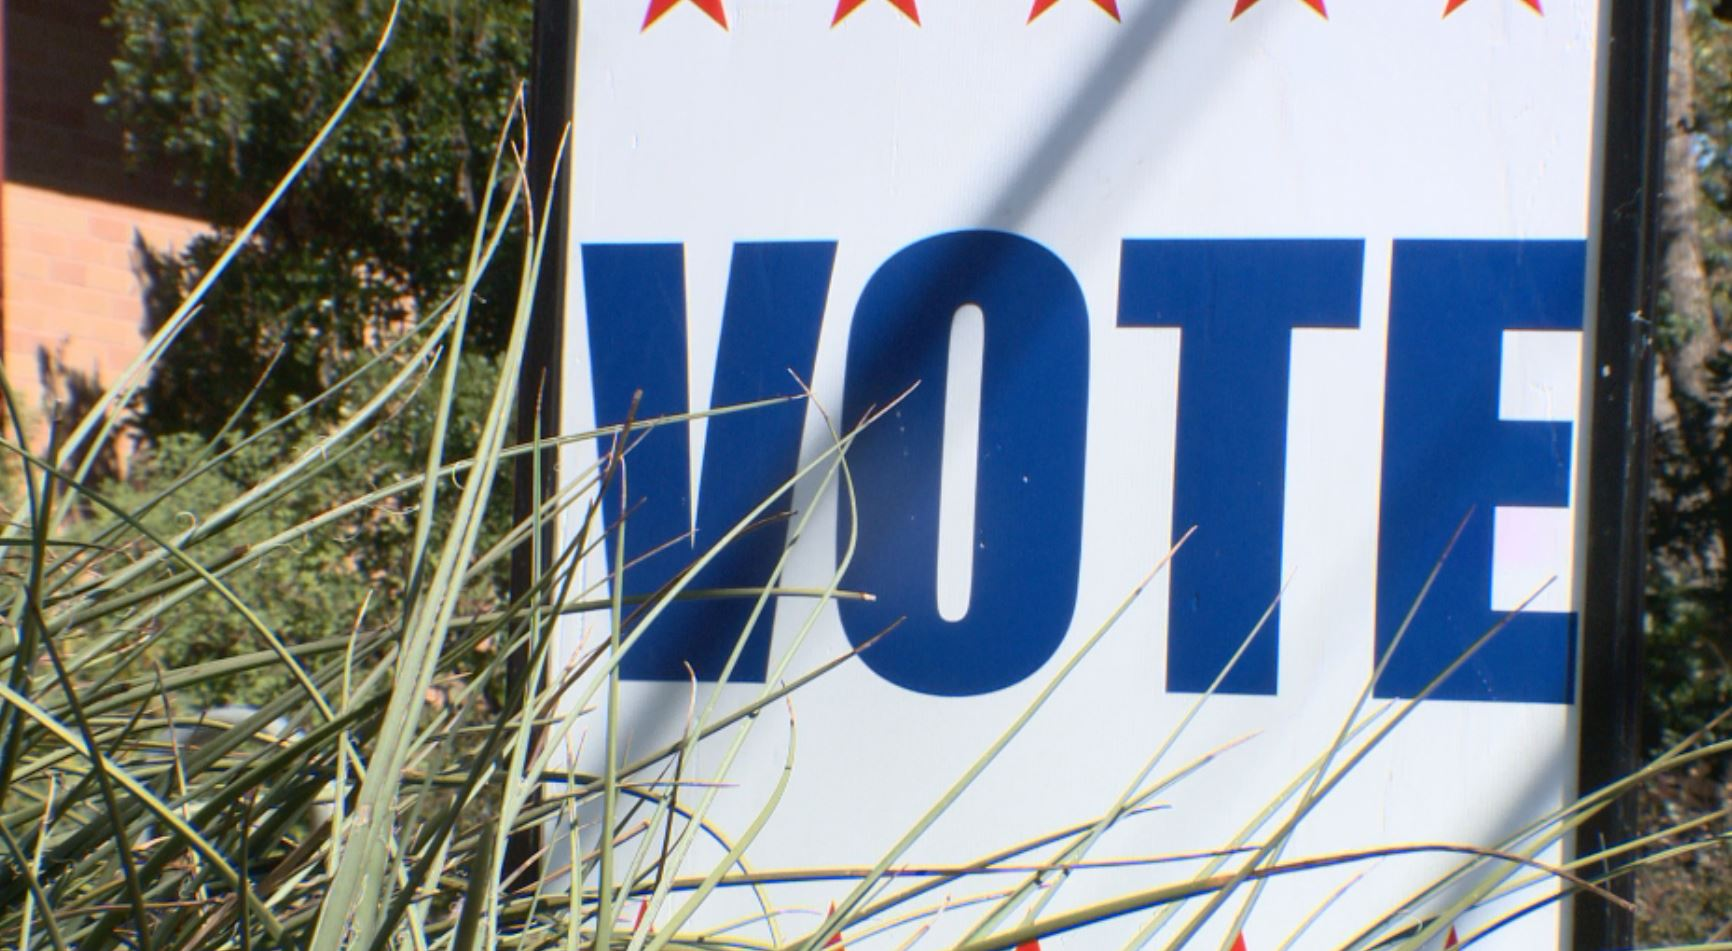 Vote Voting Sign_251120